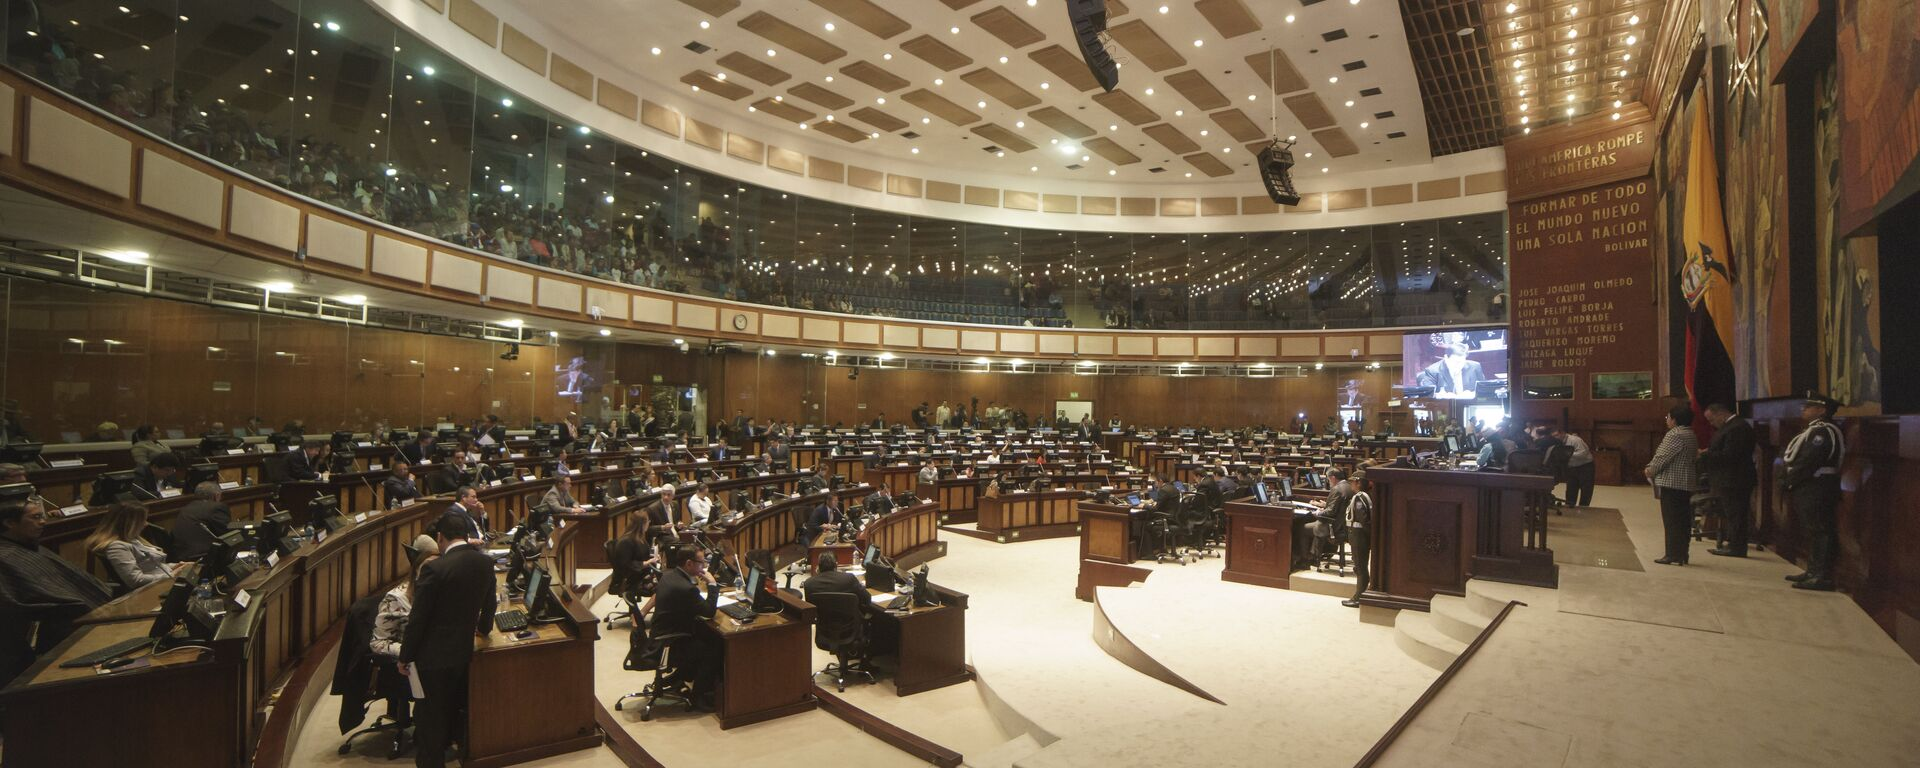 La Asamblea Nacional de Ecuador (archivo) - Sputnik Mundo, 1920, 11.10.2021